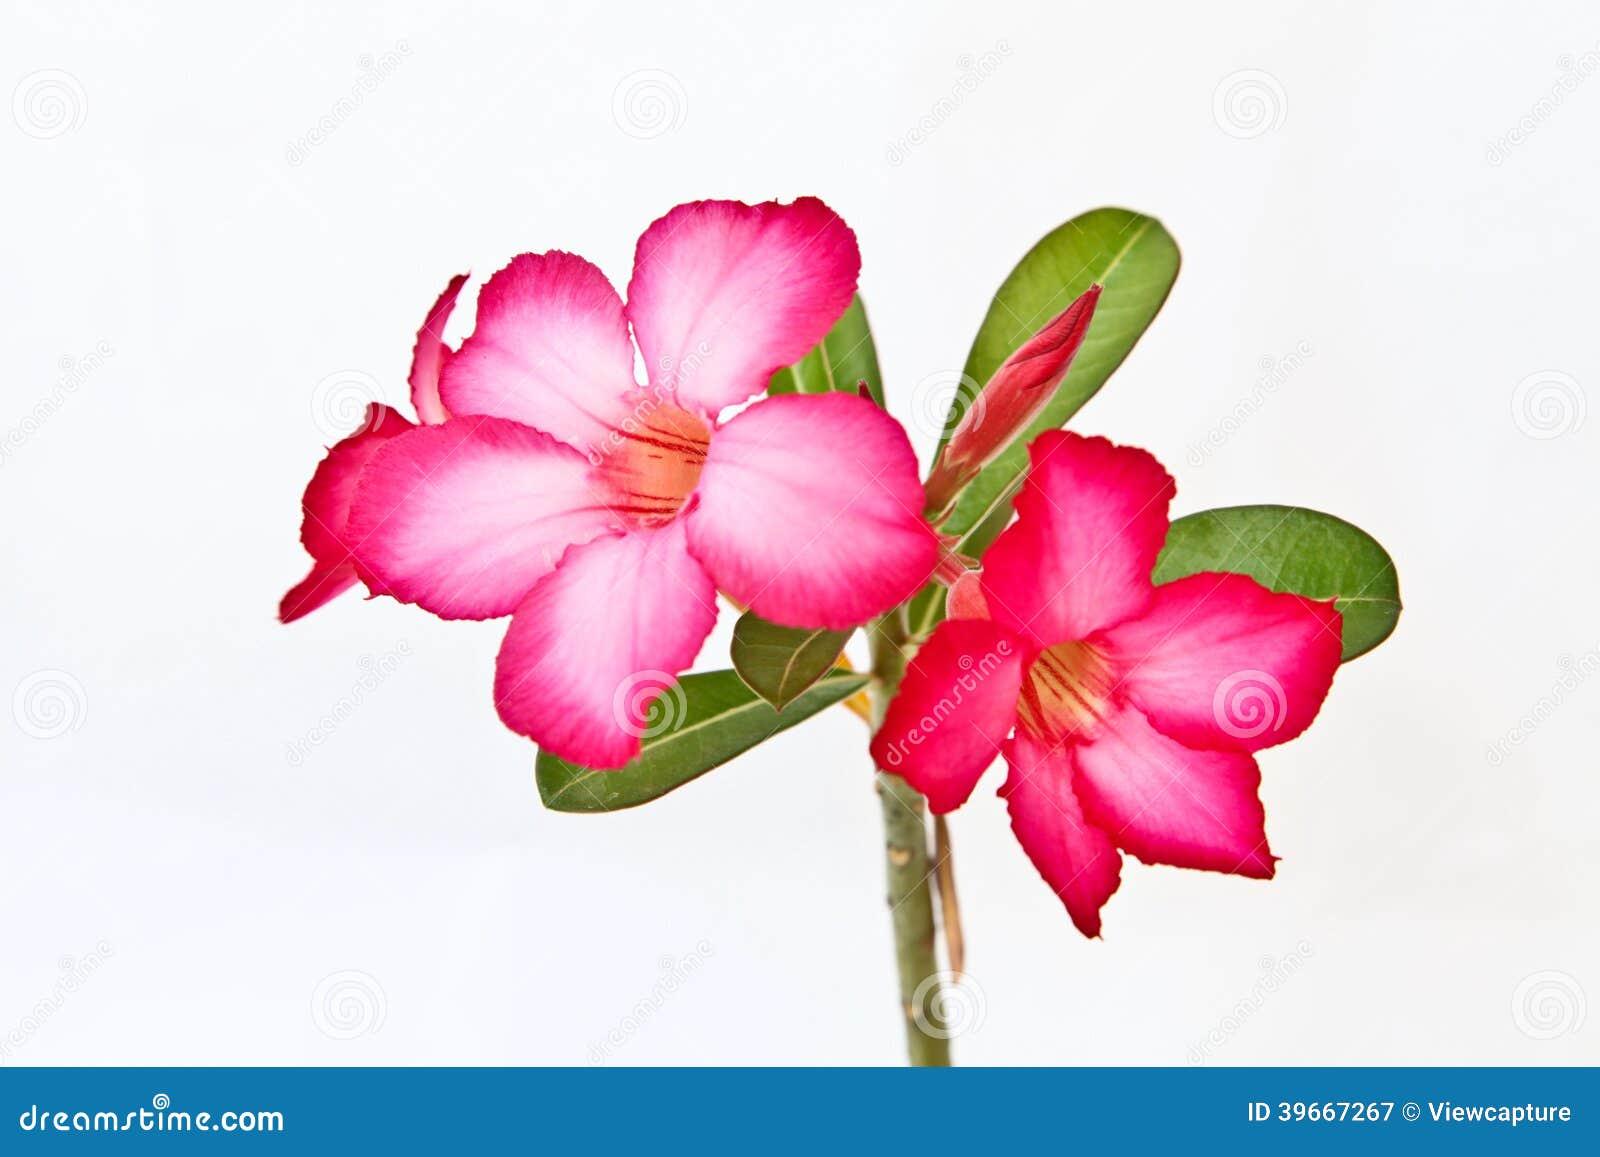 Isolated pink bignonia flowers